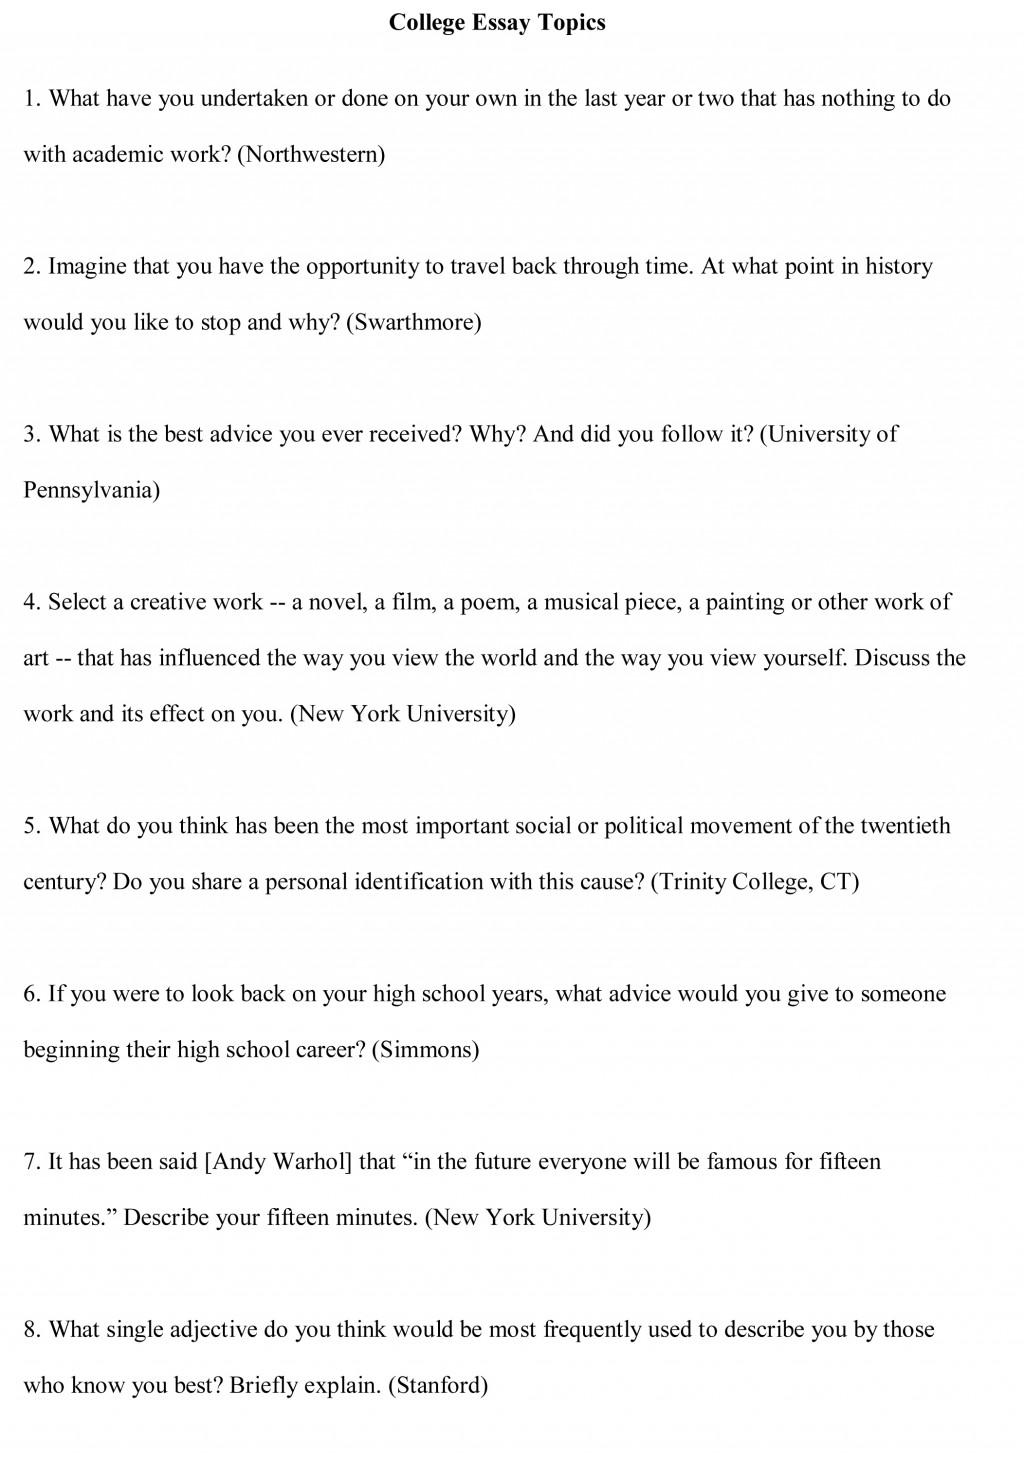 013 English Essay Topics Example College Free Dreaded Literature Question Paper For Class 10 Icse 2015 Maharashtra Board Large